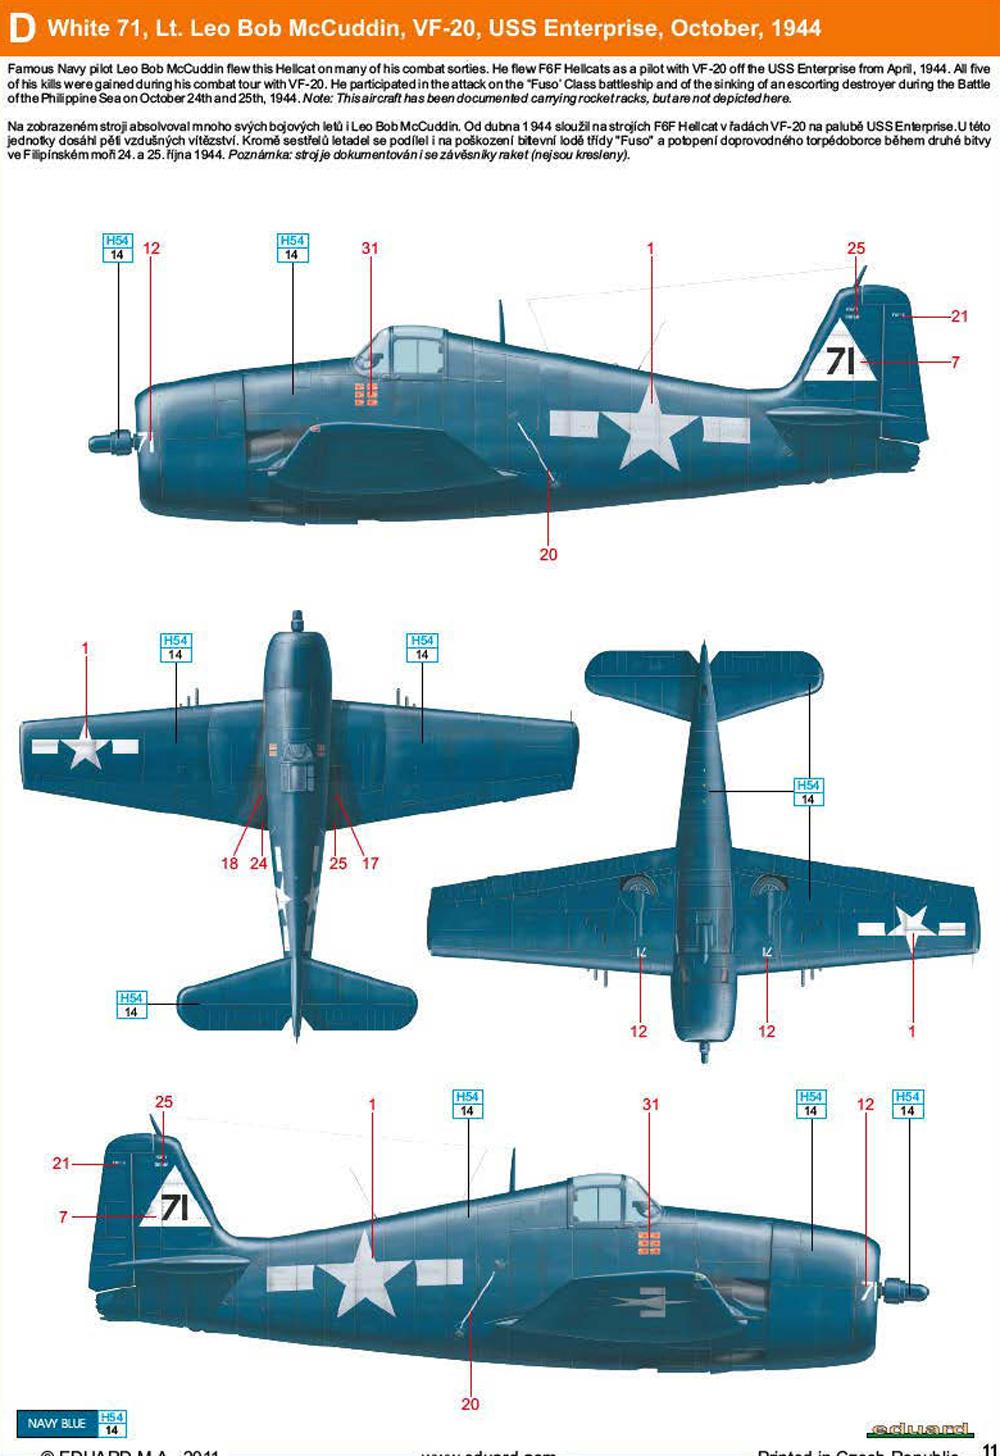 Grumman F6F 5 Hellcat VF 20 White 71 Leo Bob McCuddin CV 6 USS Enterprise Oct 1944 0A